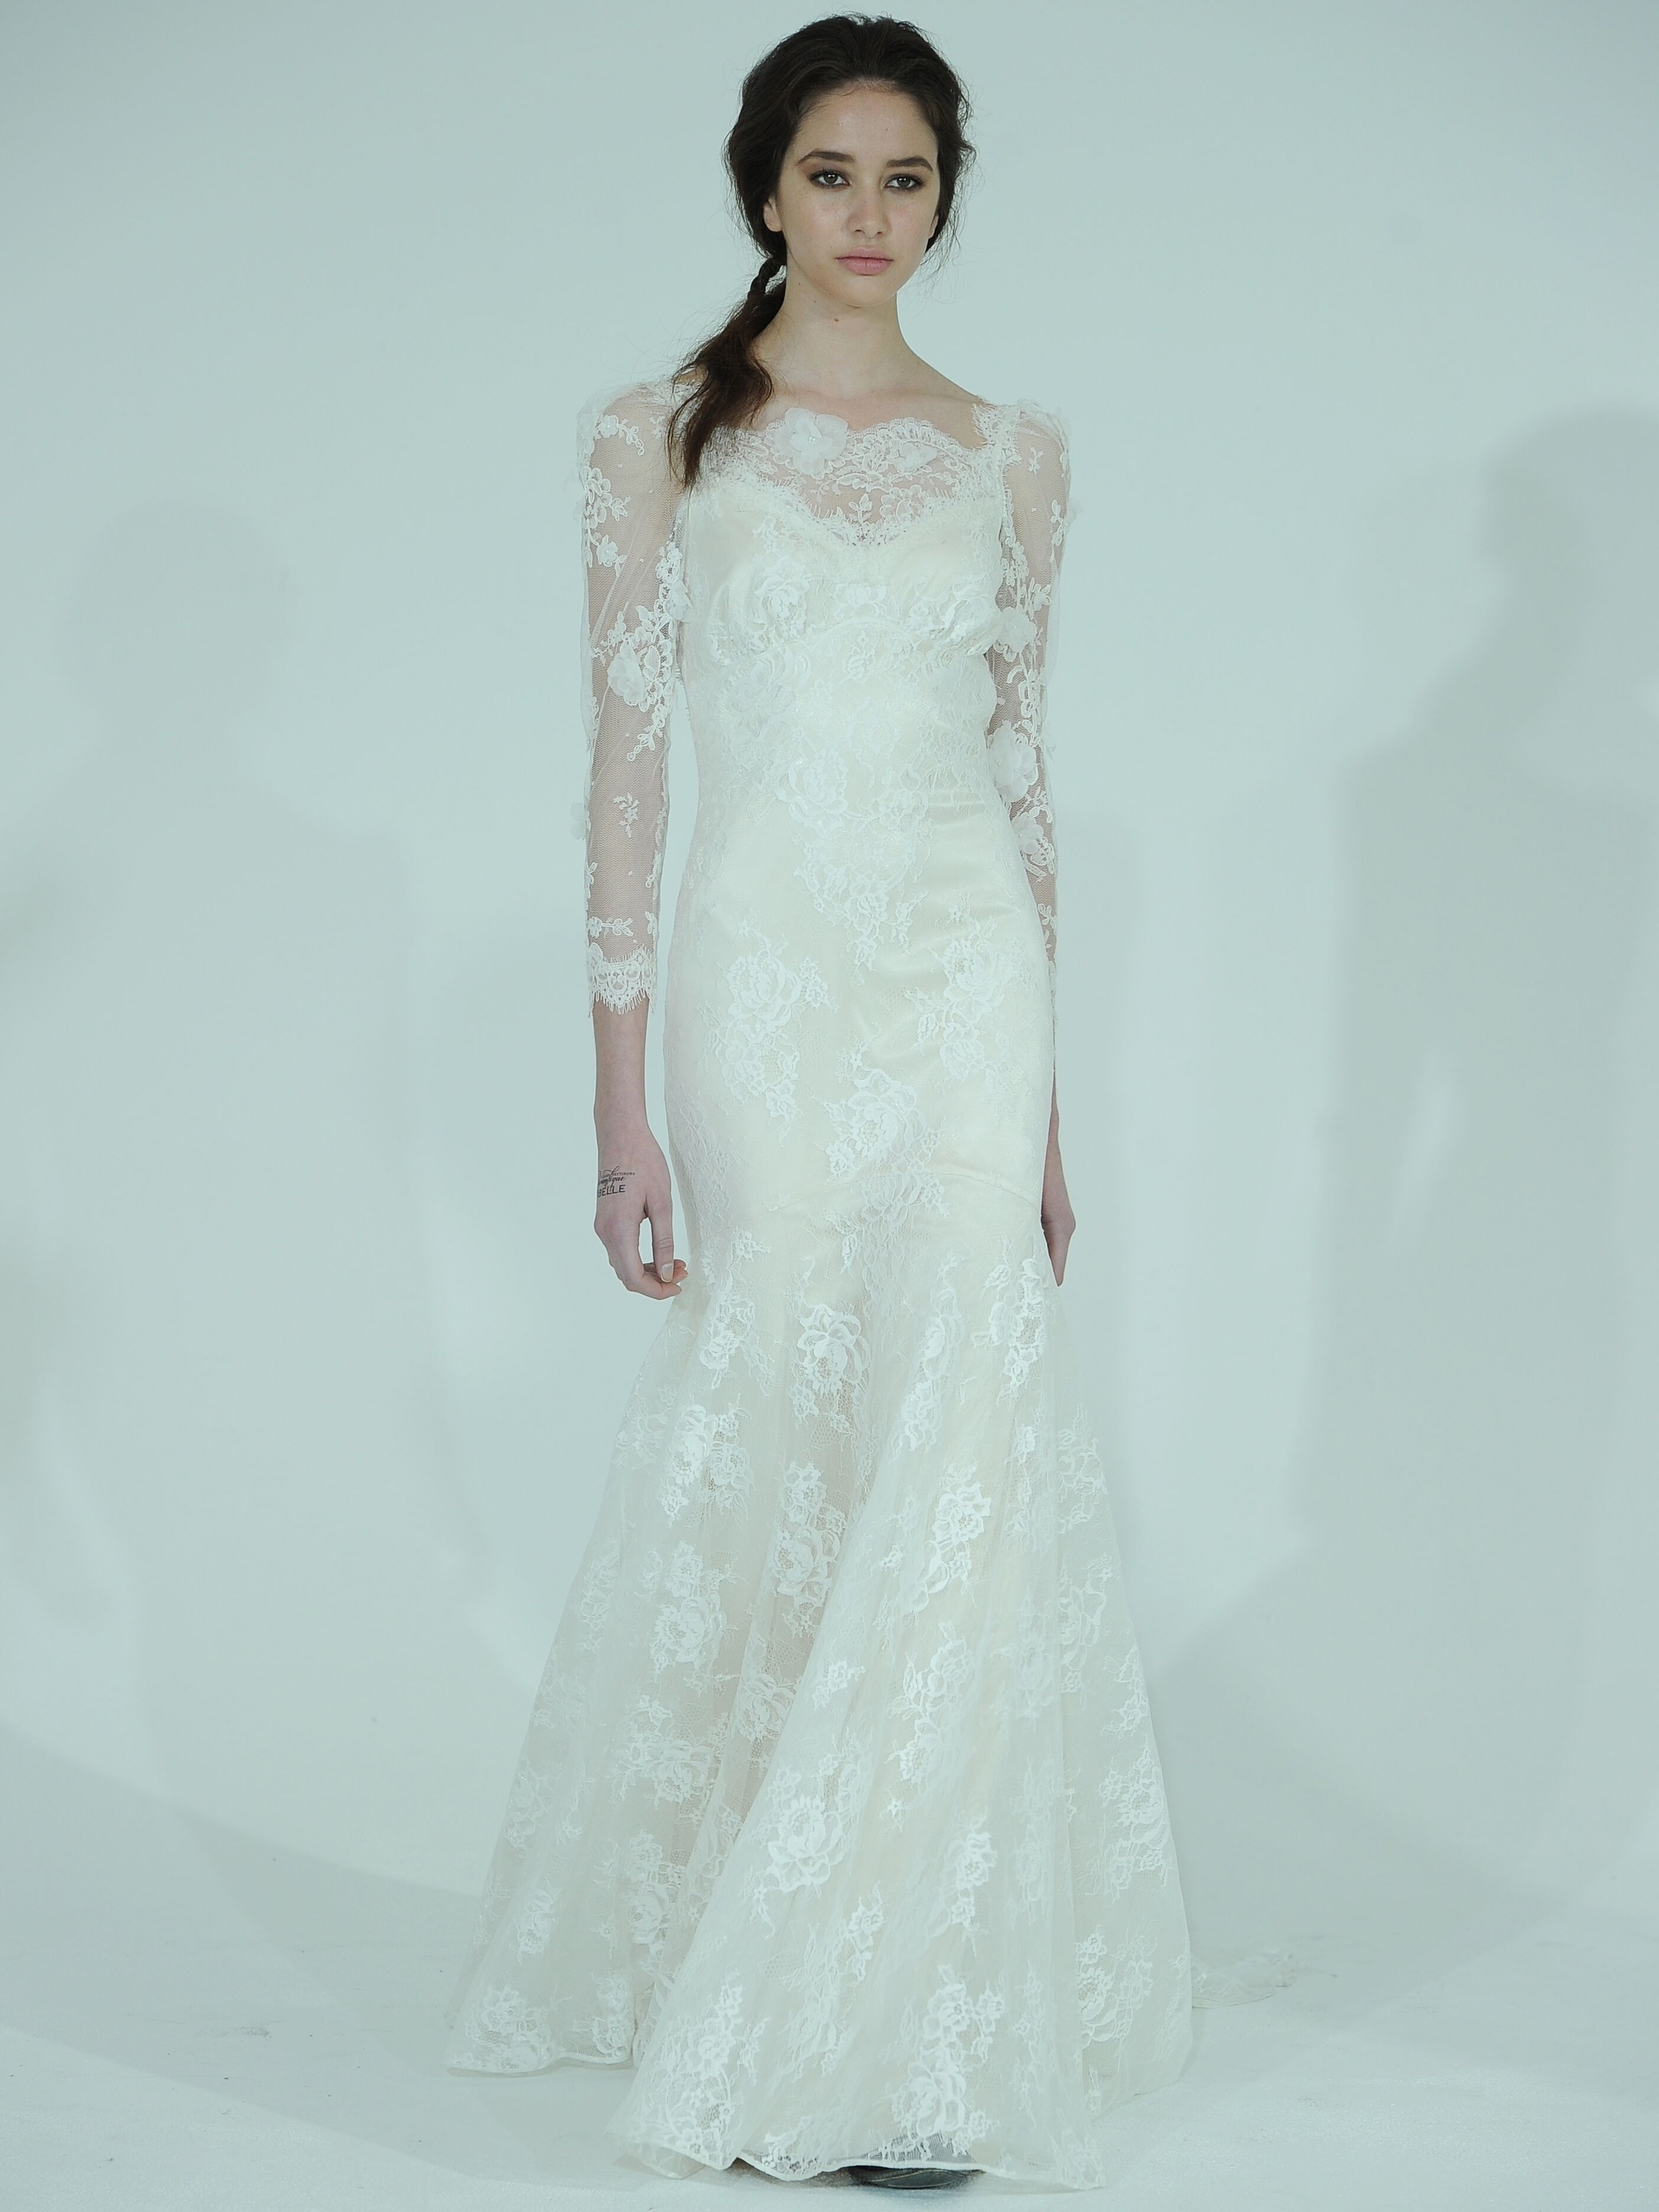 See Nikki Reed\'s Custom Claire Pettibone Wedding Dress!